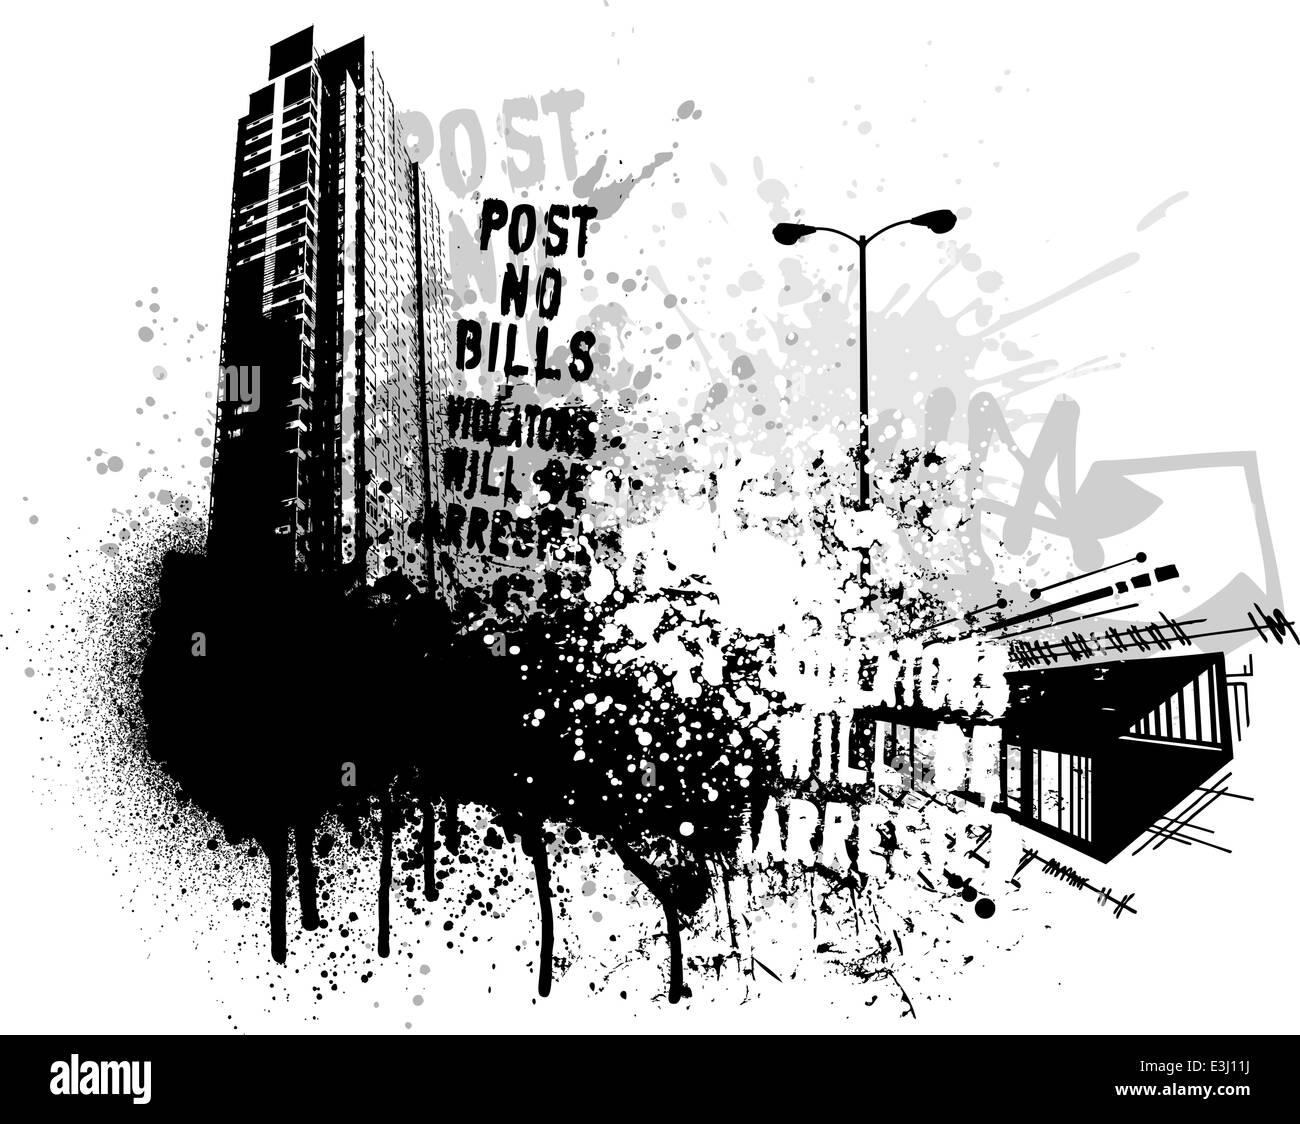 Black graffiti and paint splatter grunge city image Stock Vector